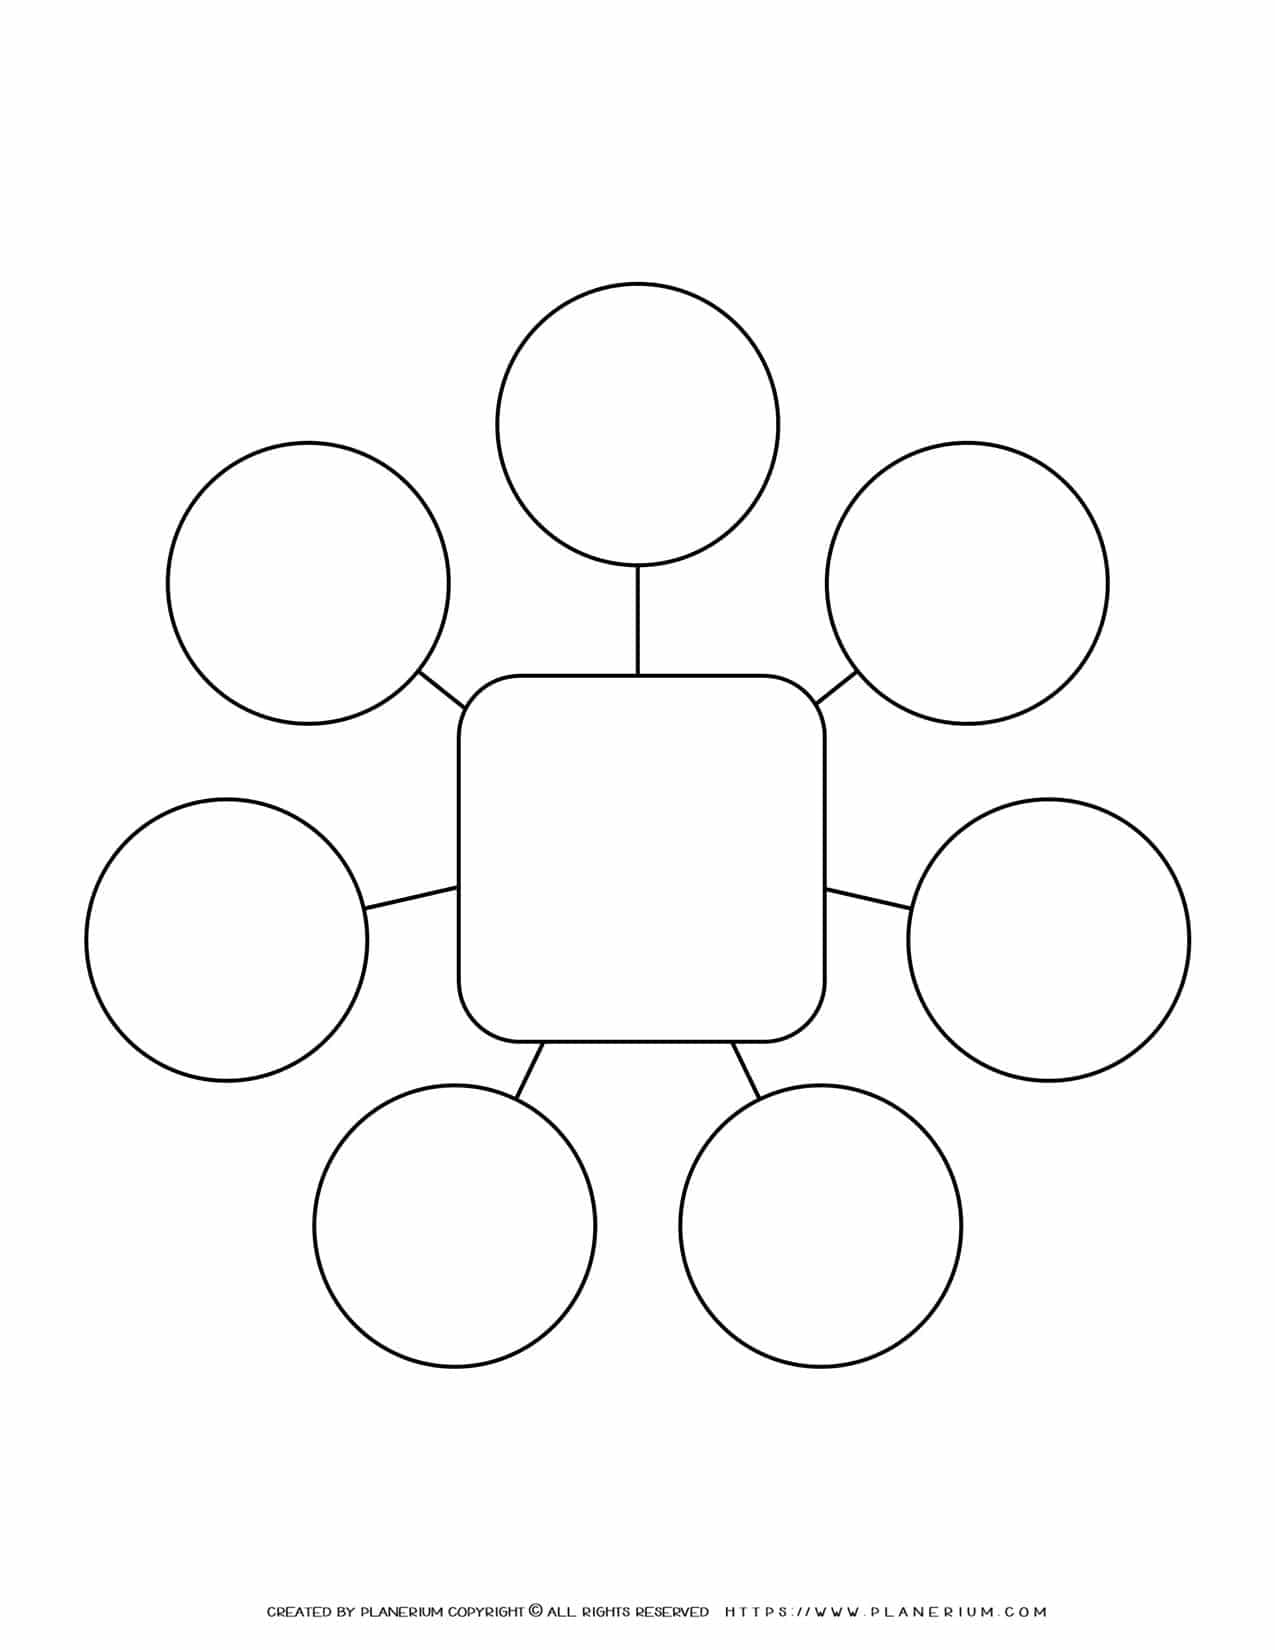 Mind Map Template - Seven Ideas - Square | Planerium